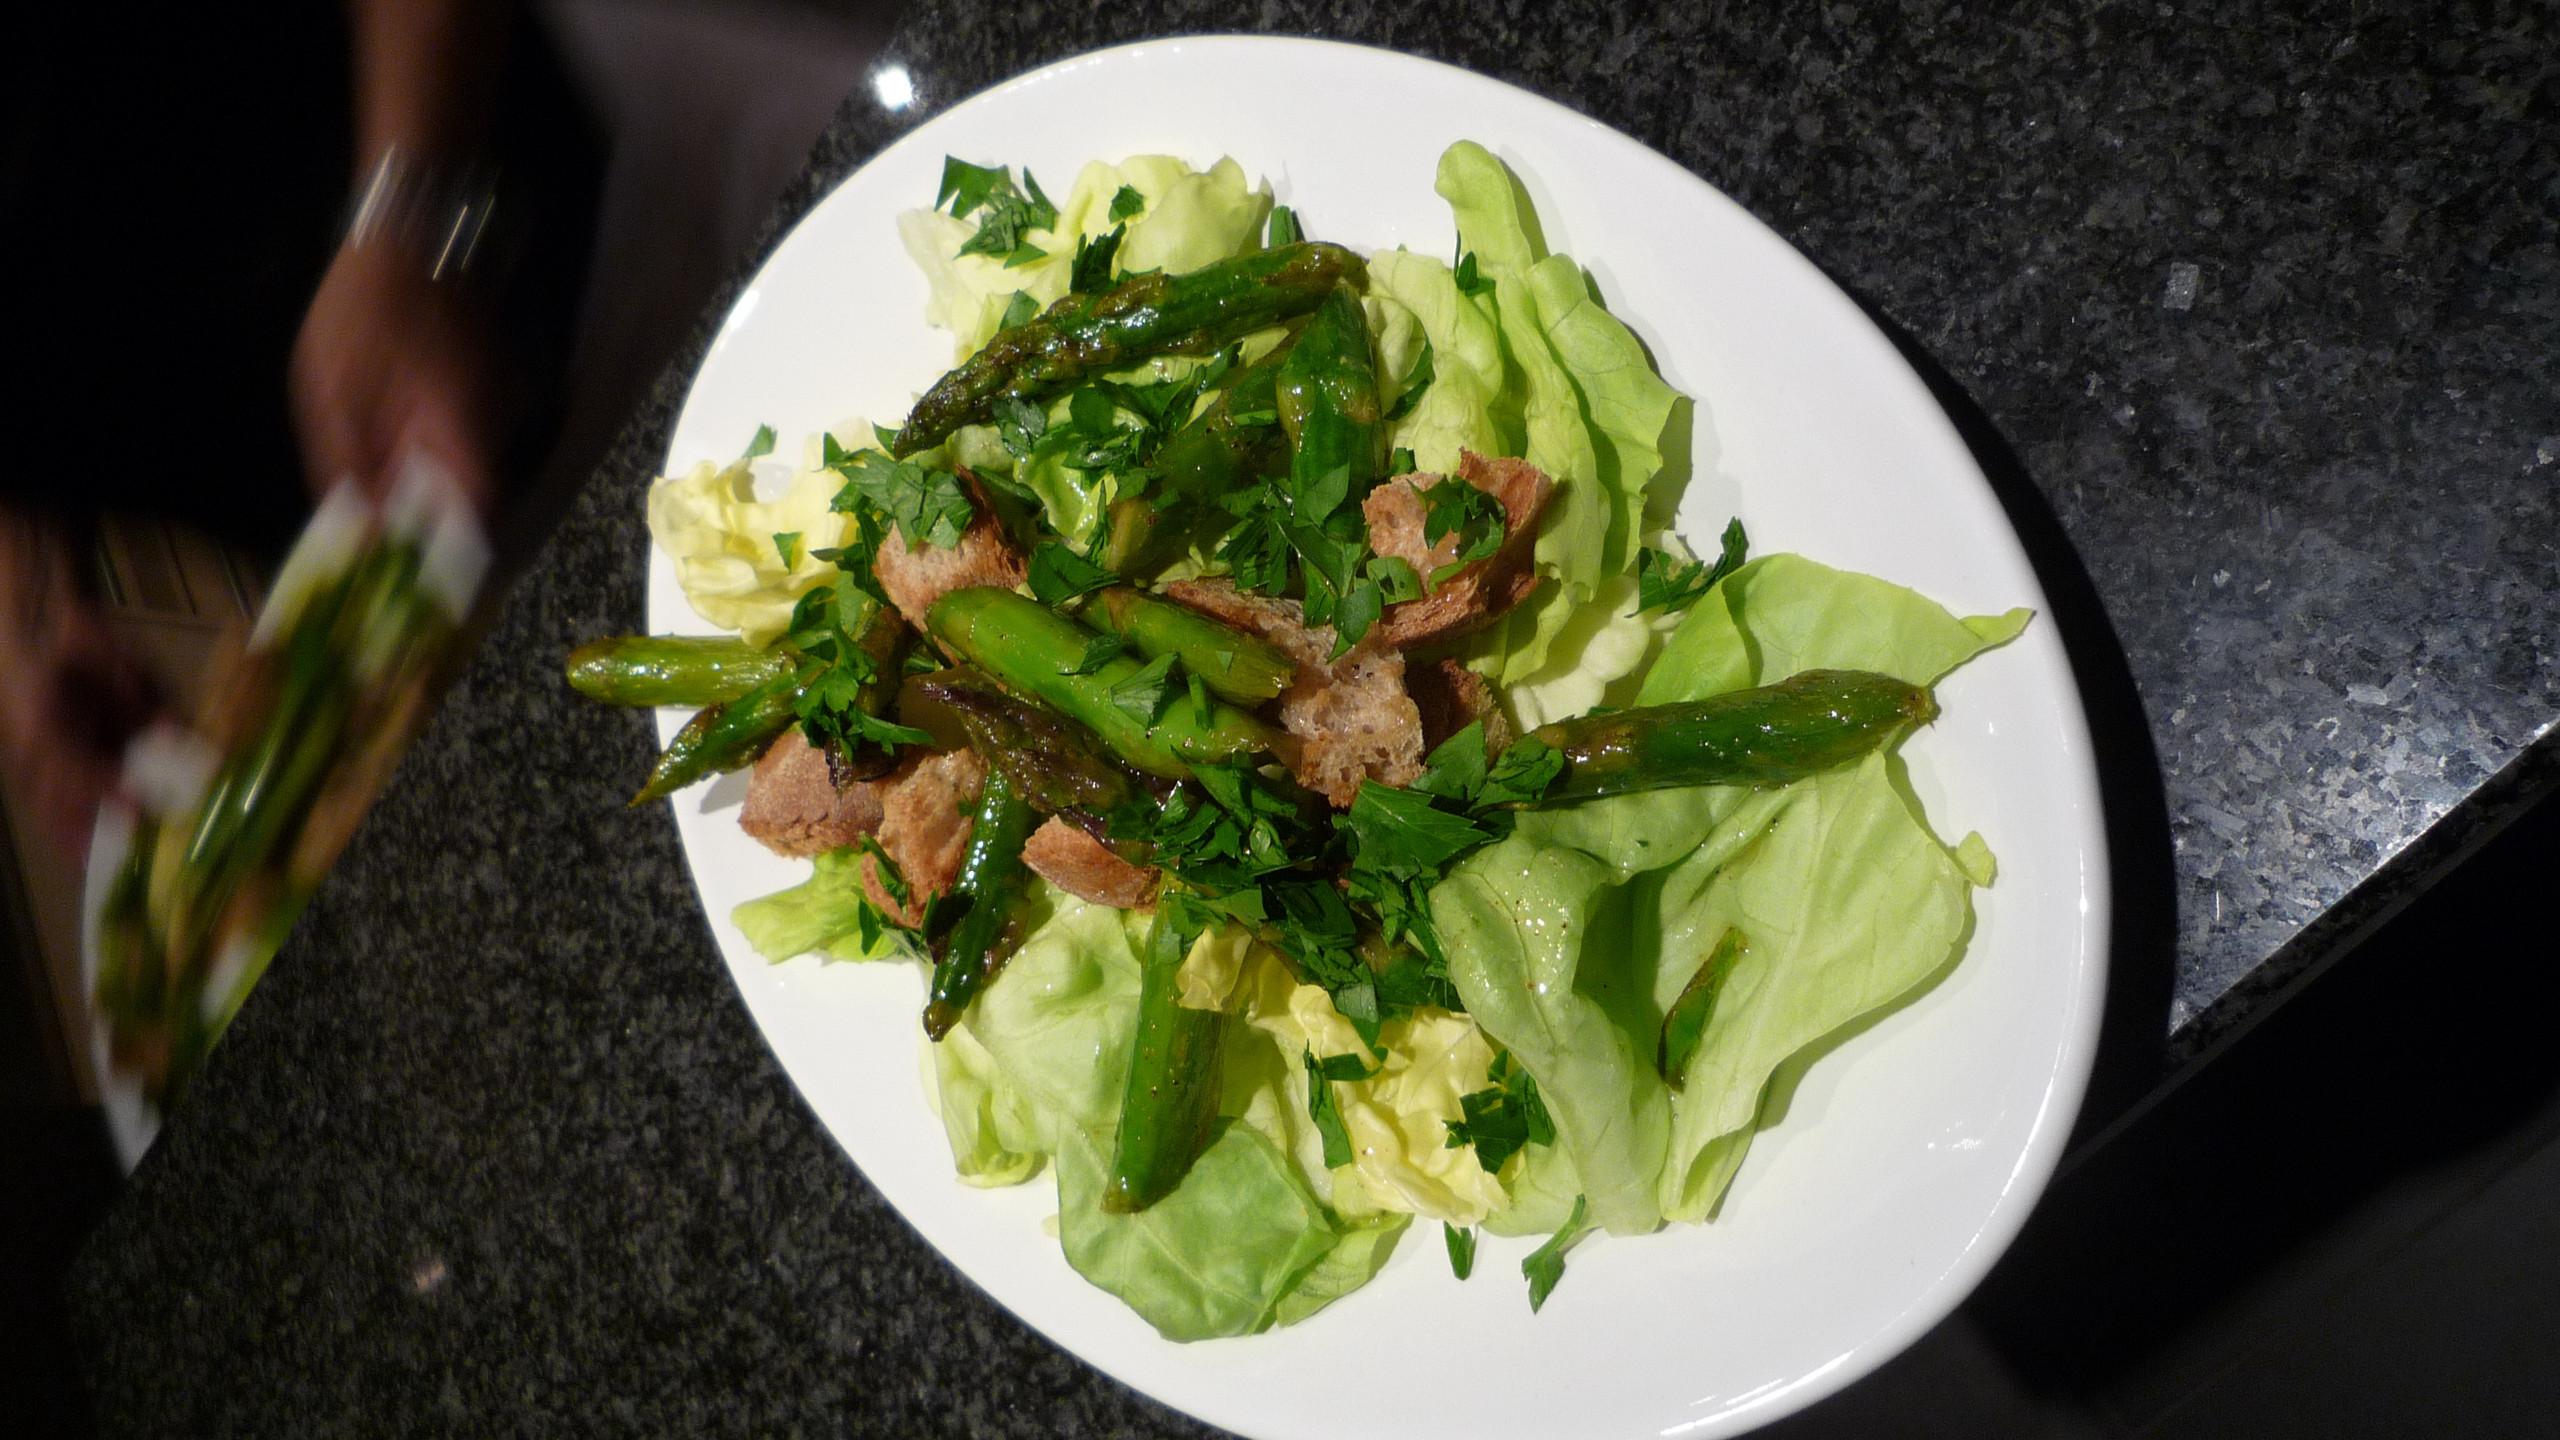 Lauwarmer Spargel-Brot-Salat